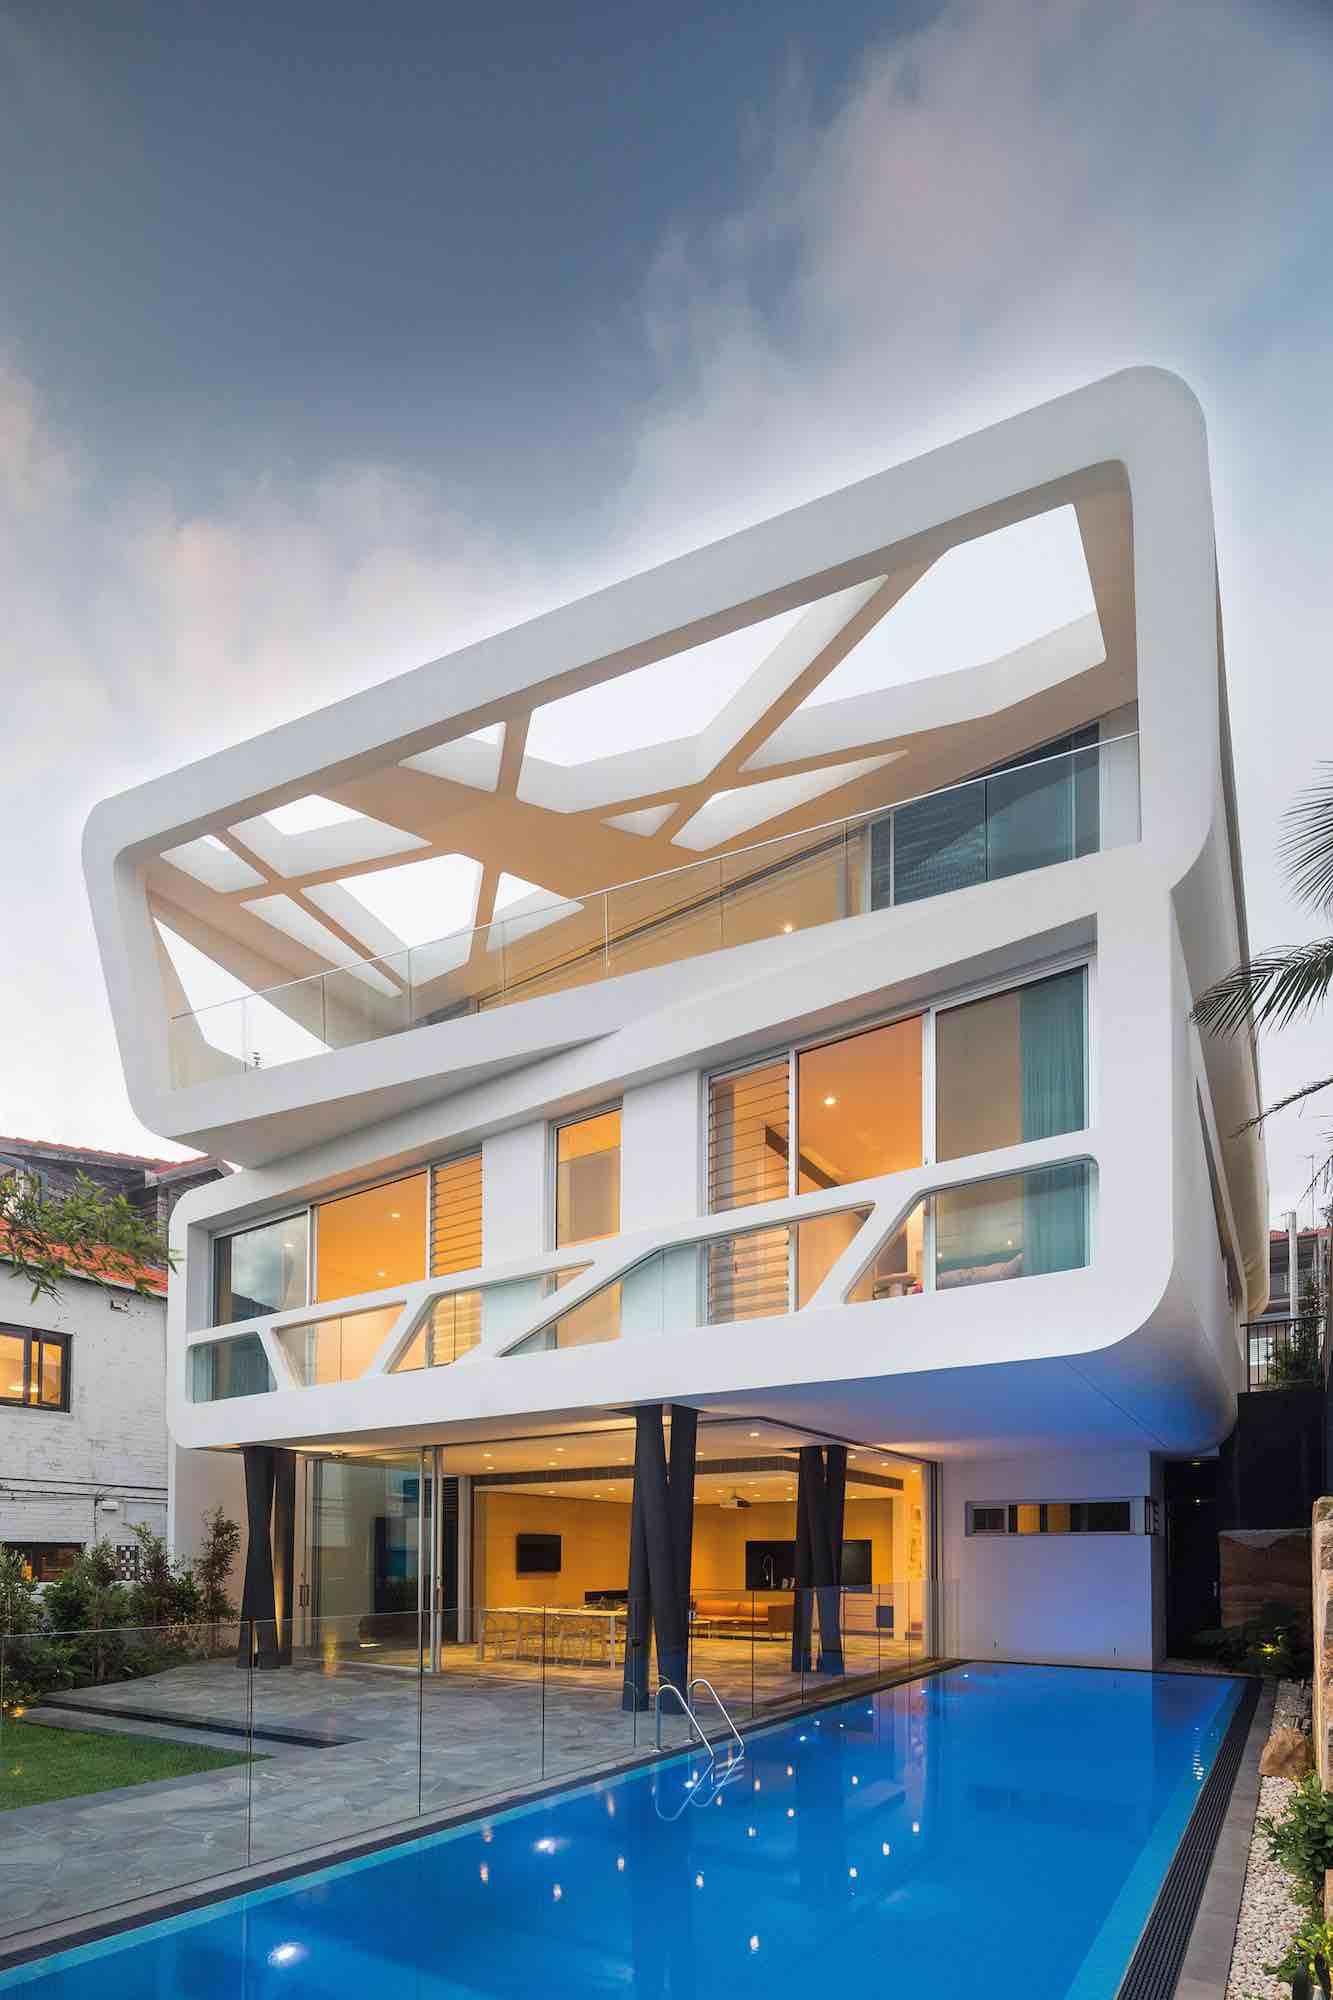 hewlett-street-house-mpr-design-group_hewlett_house17